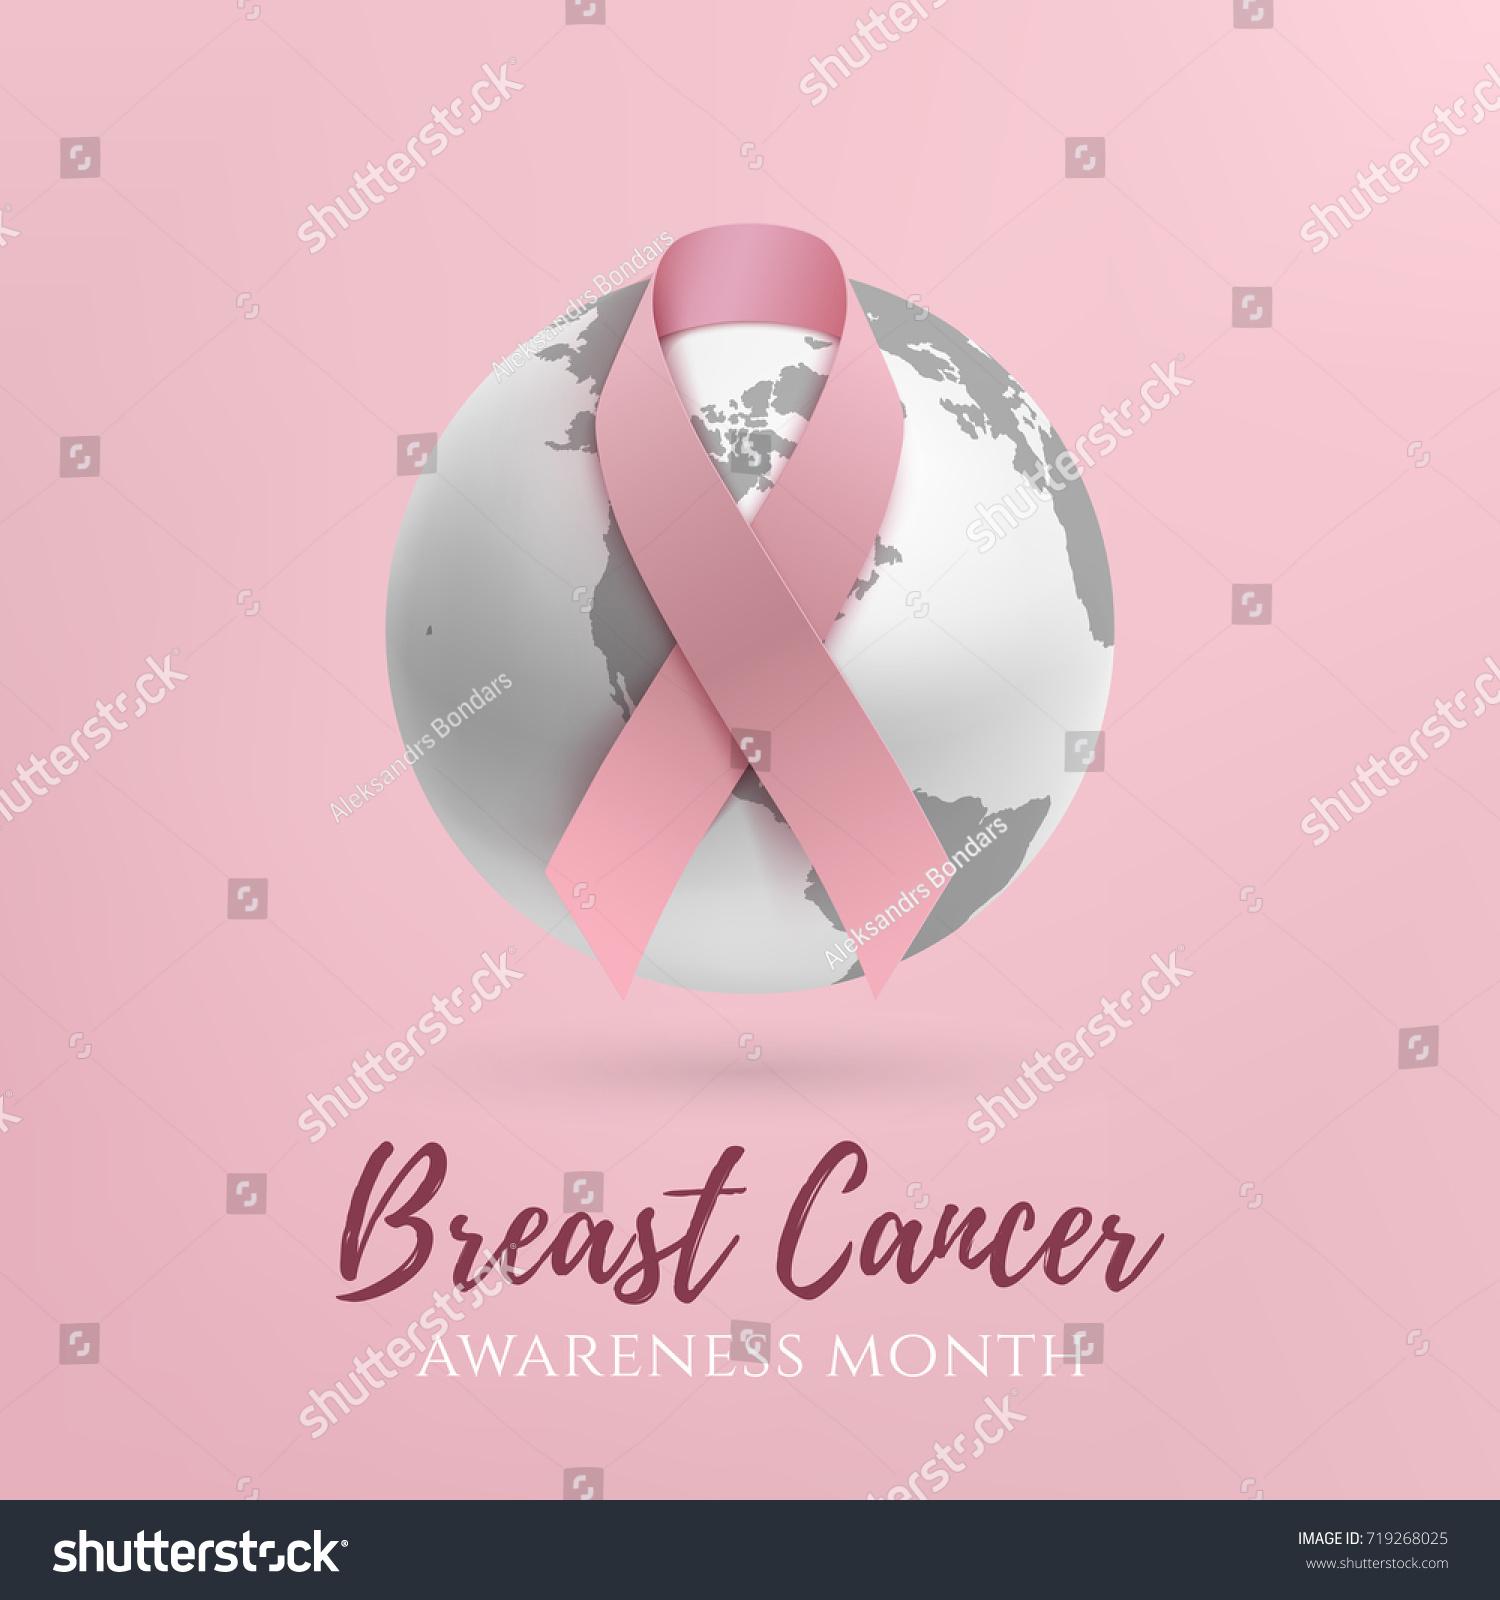 Breast Cancer Awareness Month Design Background Vector de stock ...